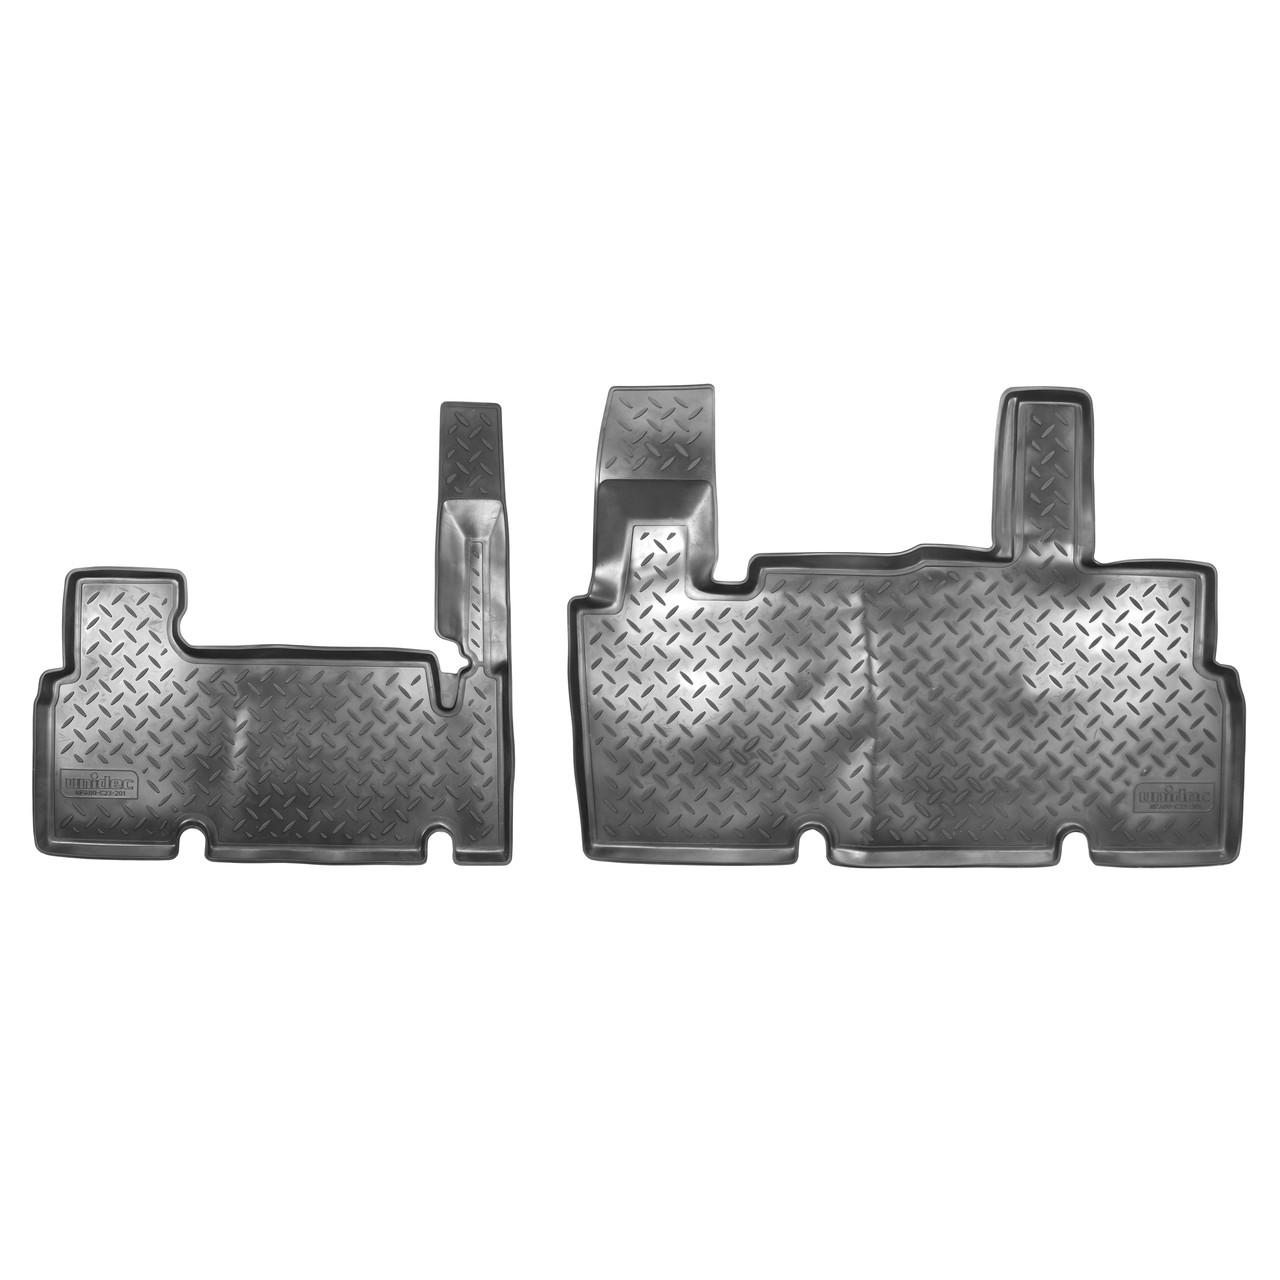 Коврики в салон ГАЗель Цельно-металлический фургон КОМБИ (2003) (зад)